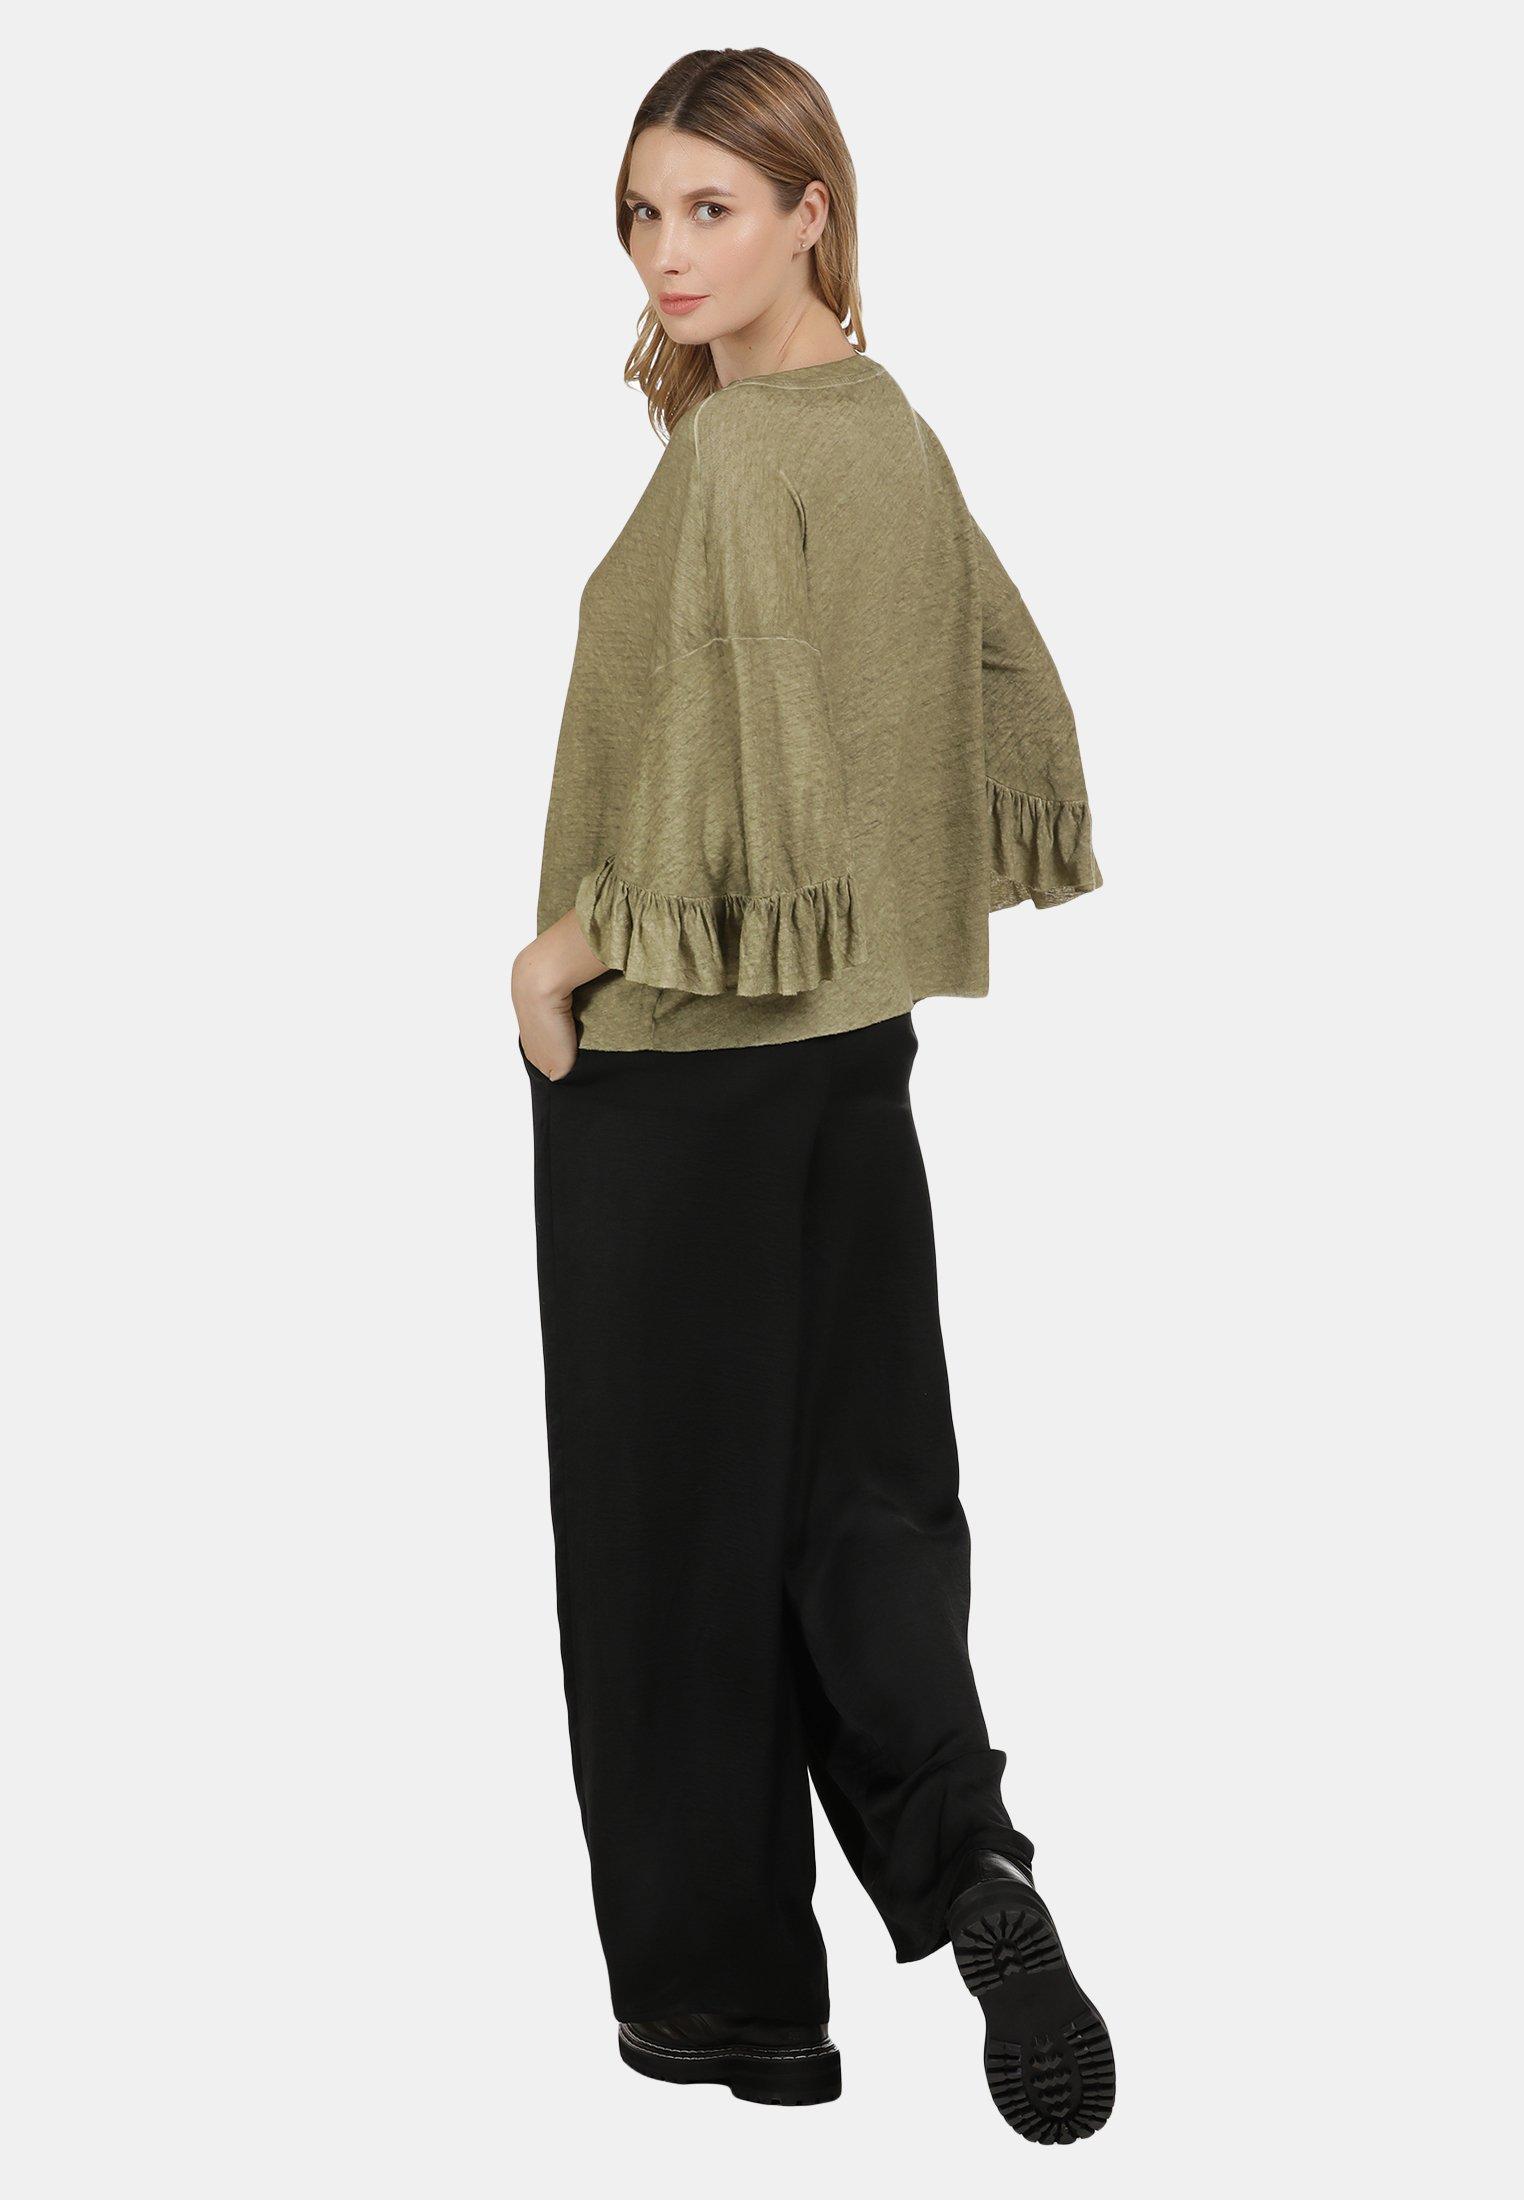 2020 Newest Women's Clothing DreiMaster BLUSE Blouse militär oliv w6slQ14eX